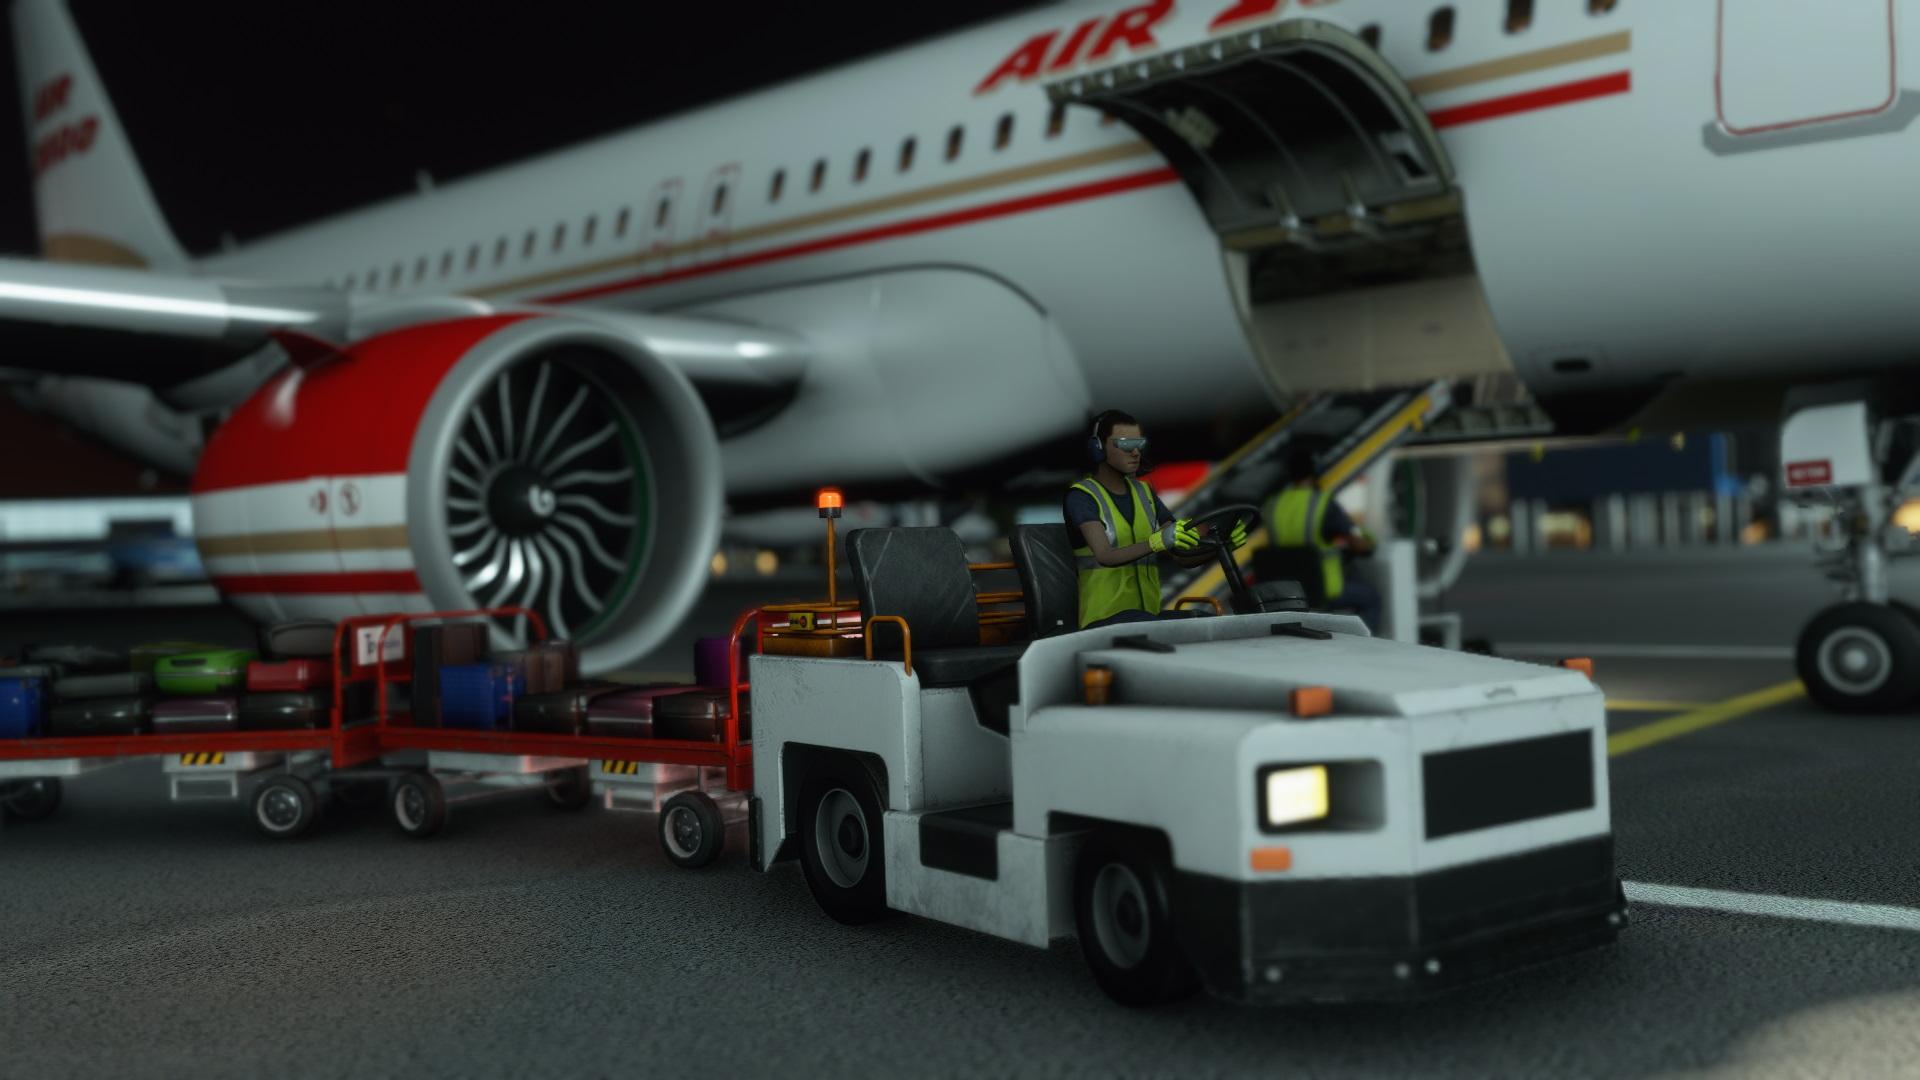 Microsoft Flight Simulator A320 Luggage Loading sim update 4